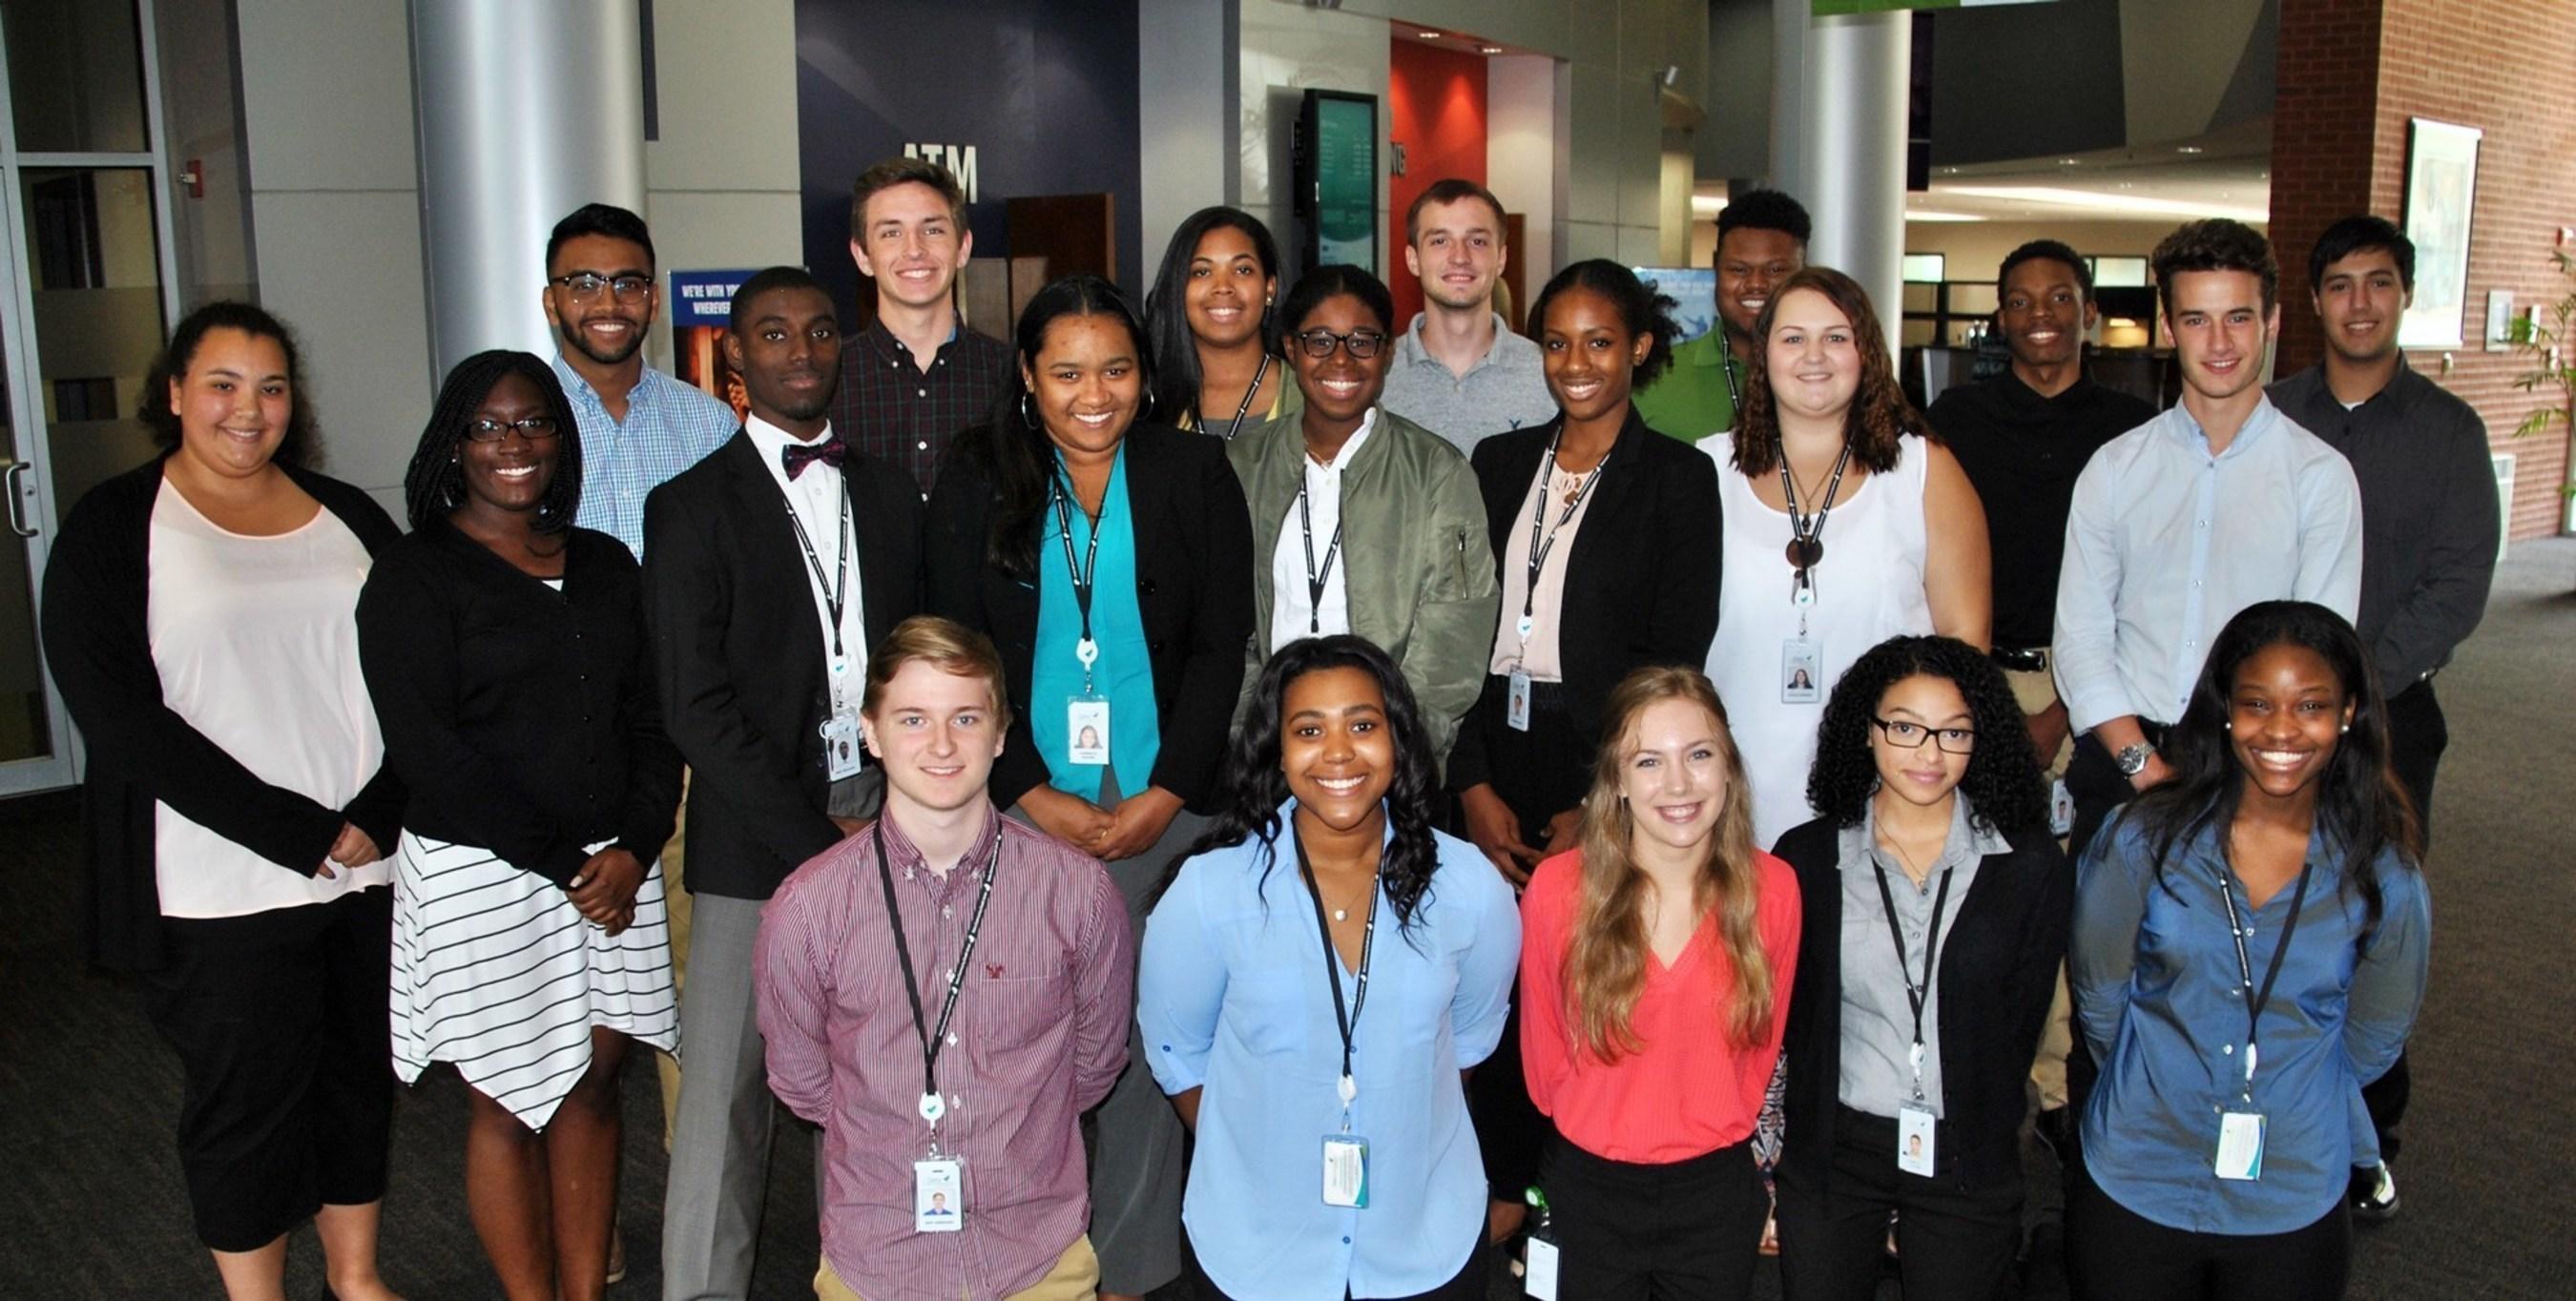 Delta Community High School Apprentice Program participants at the Credit Union's Virginia Avenue Branch.